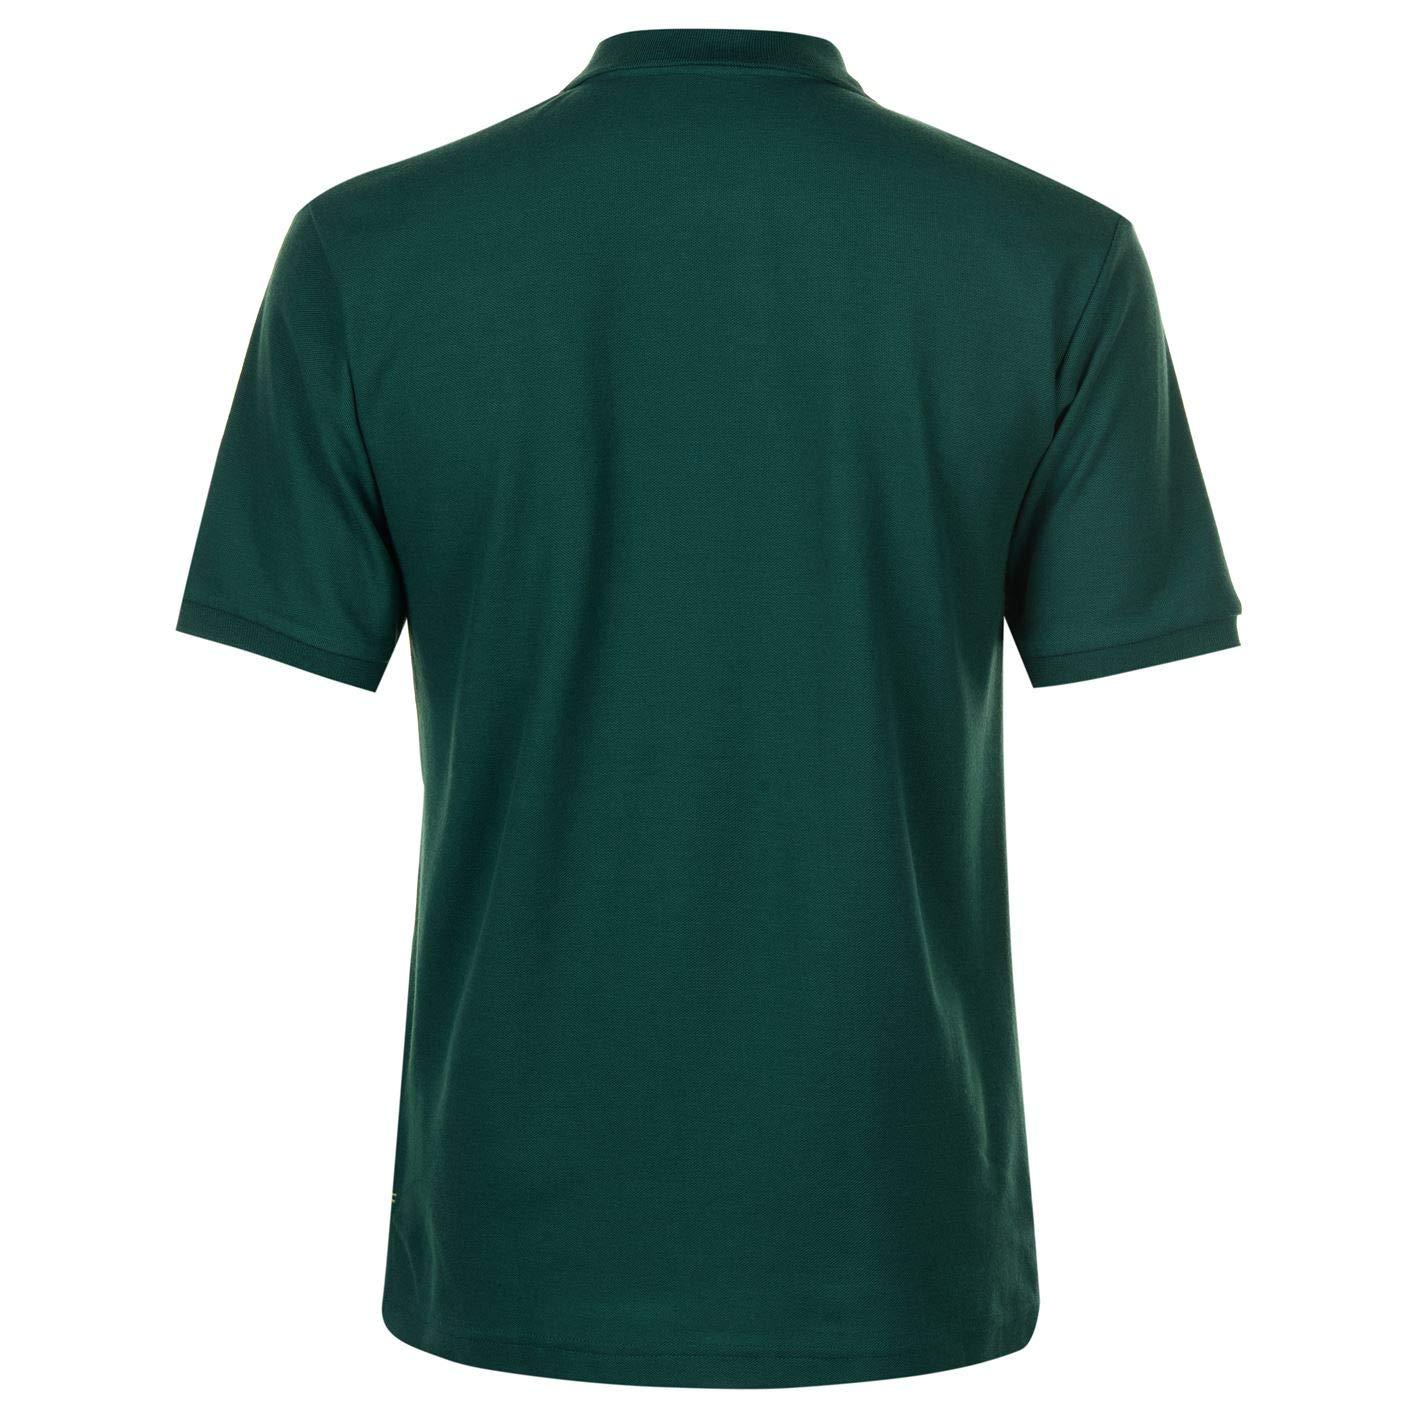 Slazenger Herren-Poloshirt, kurzarm B07J5QN85L Poloshirts Einfach zu zu zu bedienen 1ca047